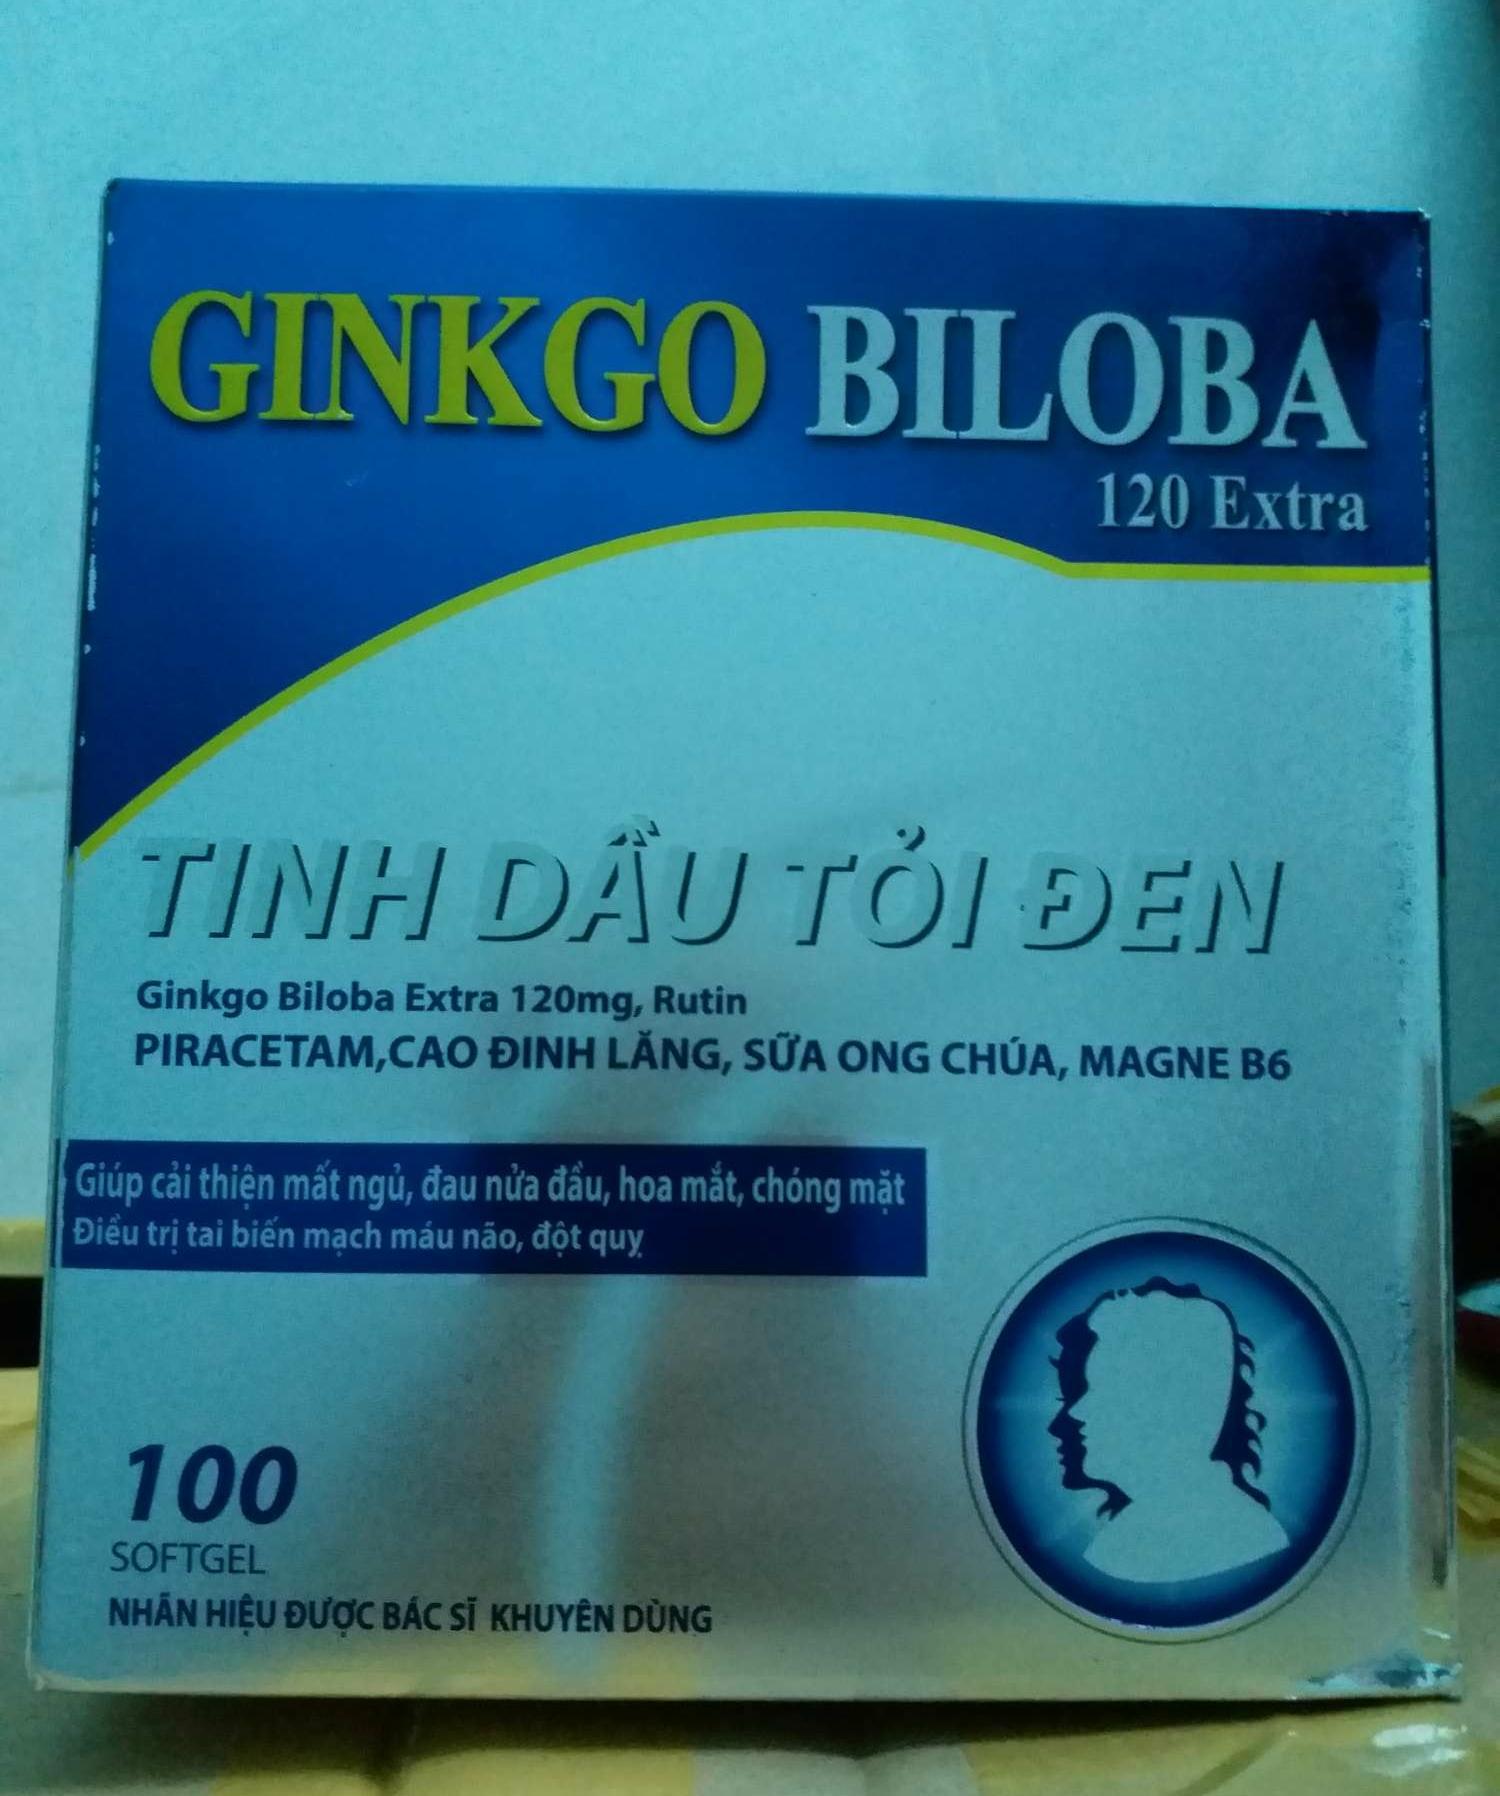 Ginkgo biloba tinh dầu tỏi đen